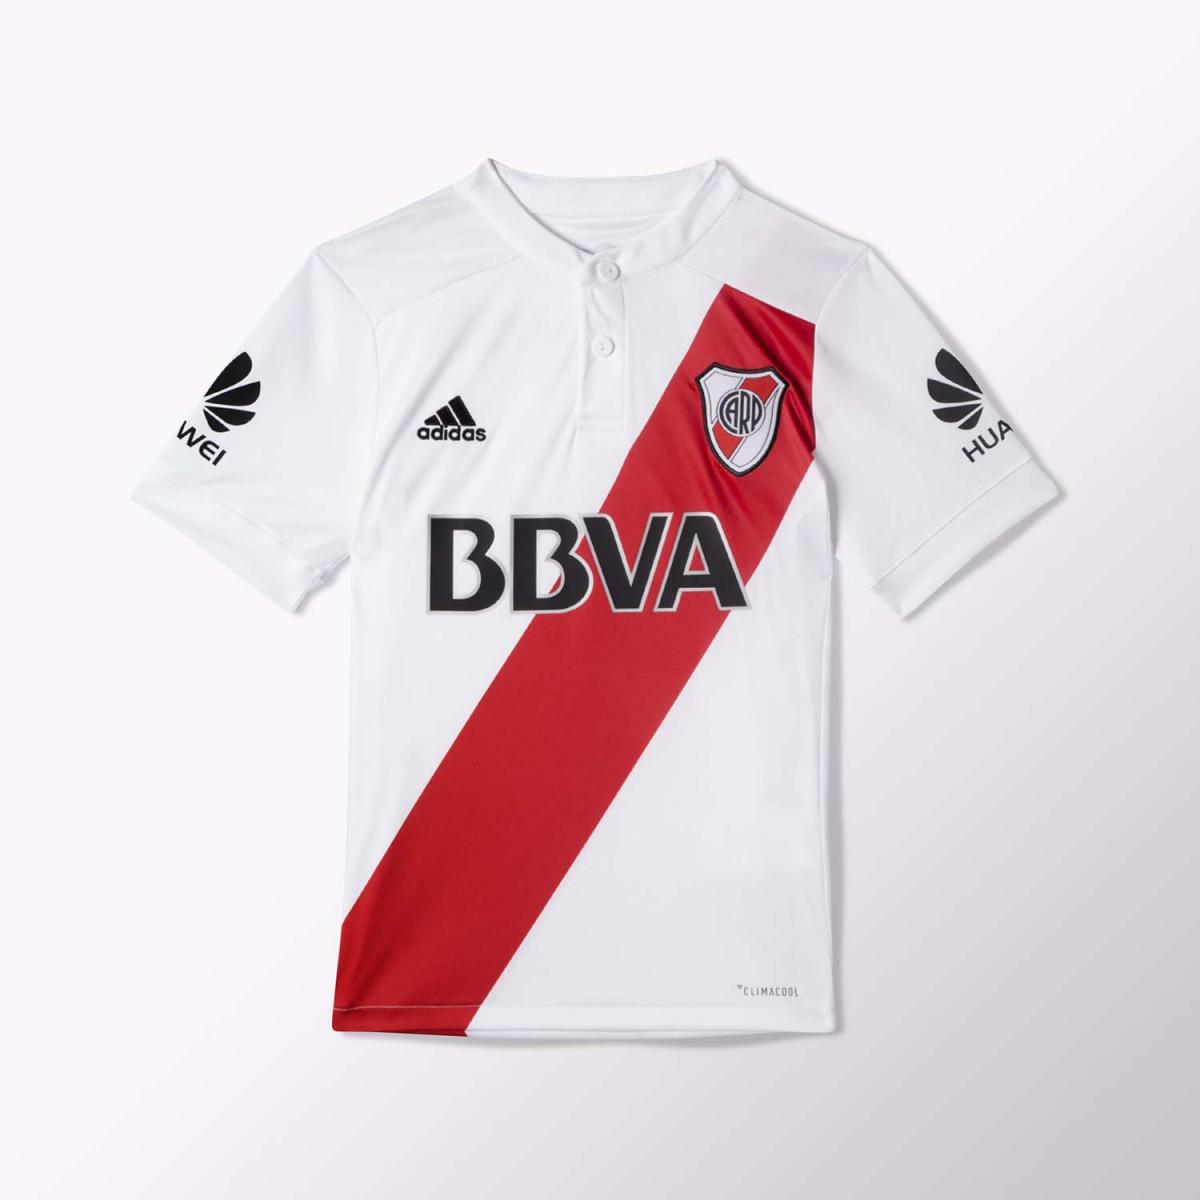 Camiseta Adidas River Plate Kids 2017/2018